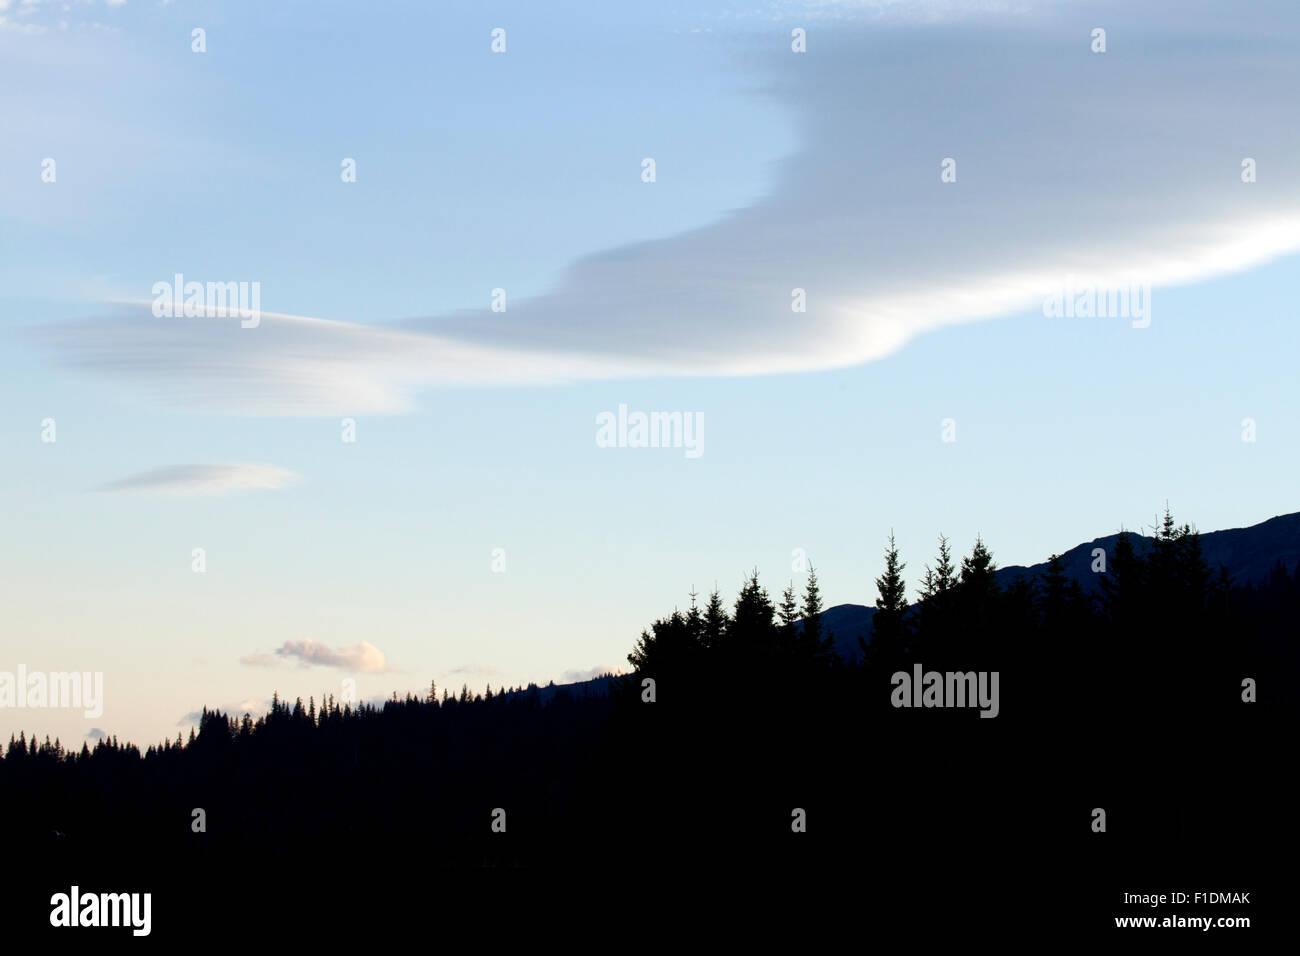 Unusual Shaped Cloud - Stock Image